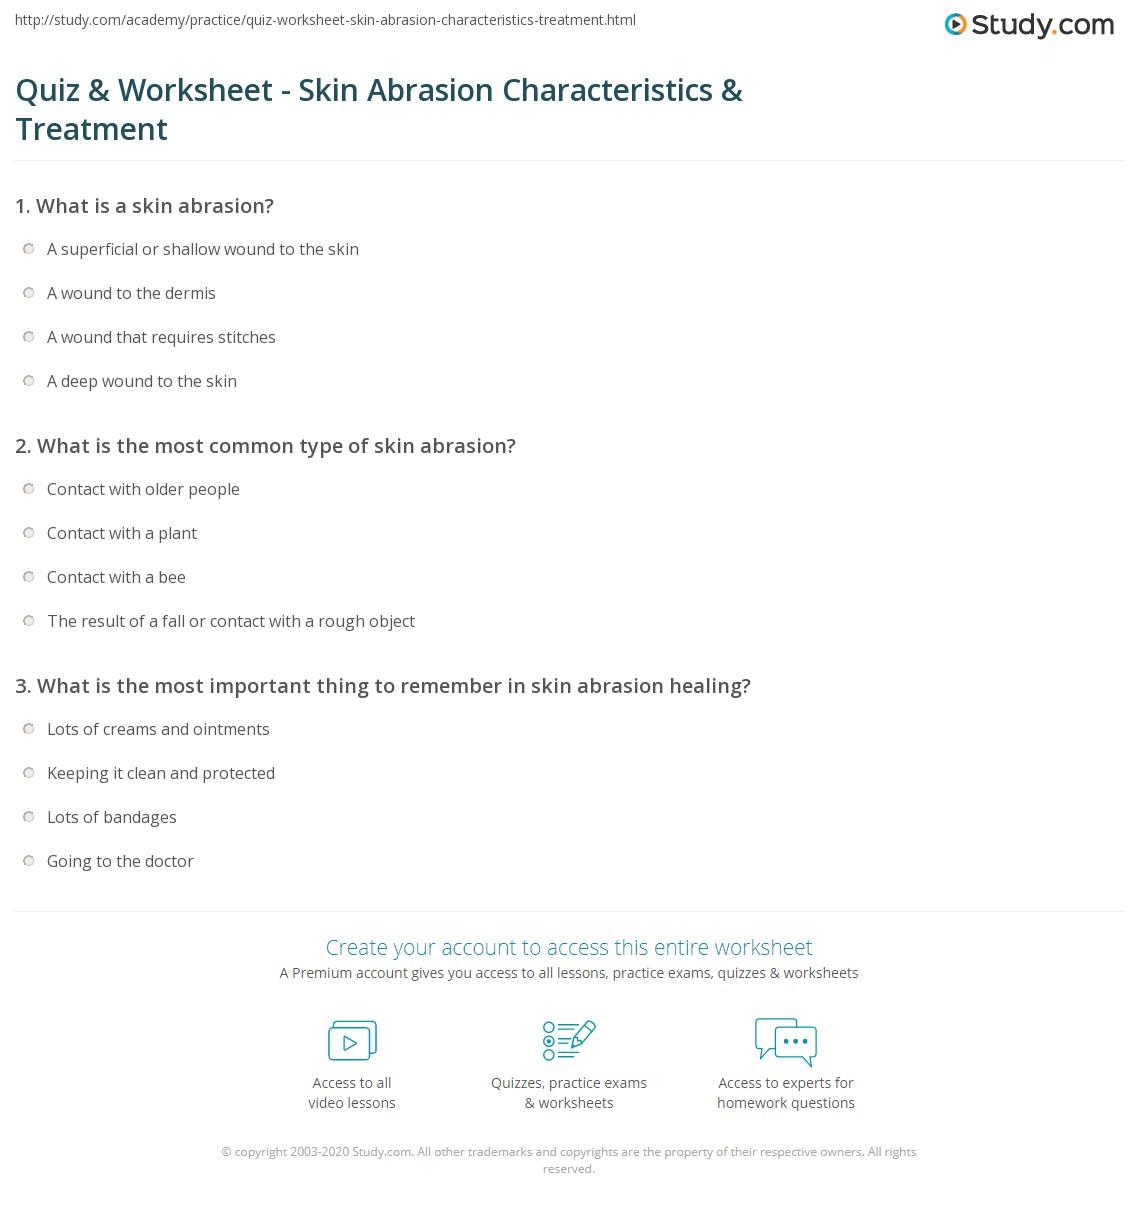 Quiz & Worksheet - Skin Abrasion Characteristics & Treatment